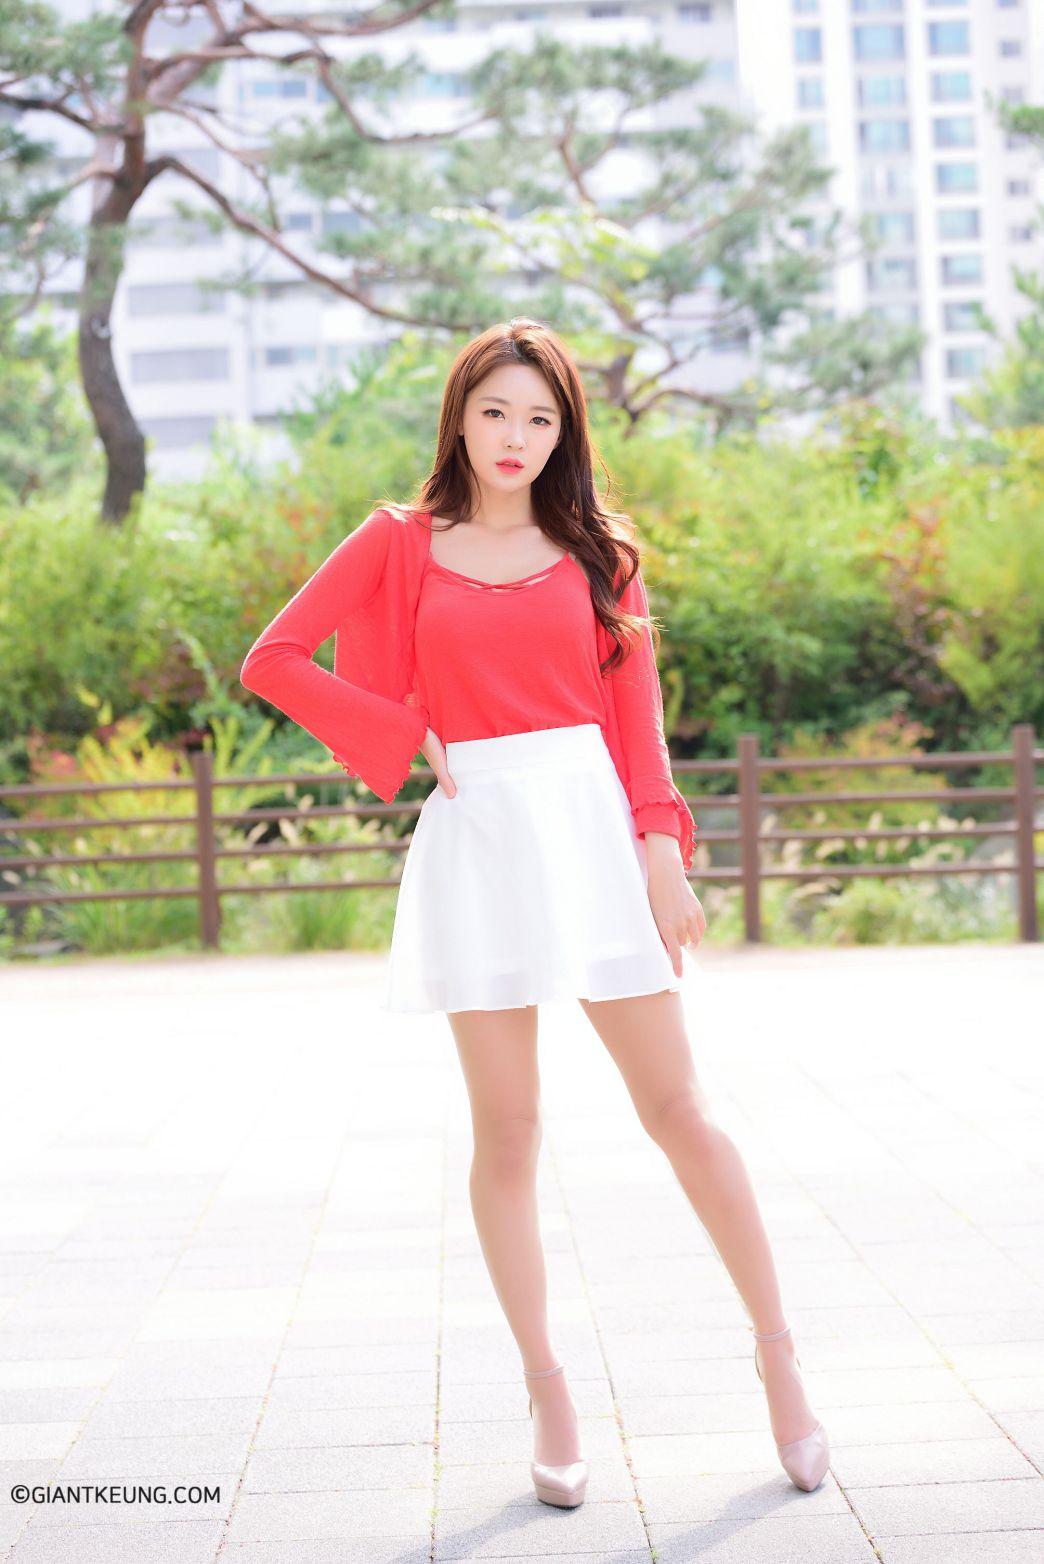 Jin Yu Ri (진유리) - 20190928 - Casual Outdoor 3 set Collection - TruePic.net